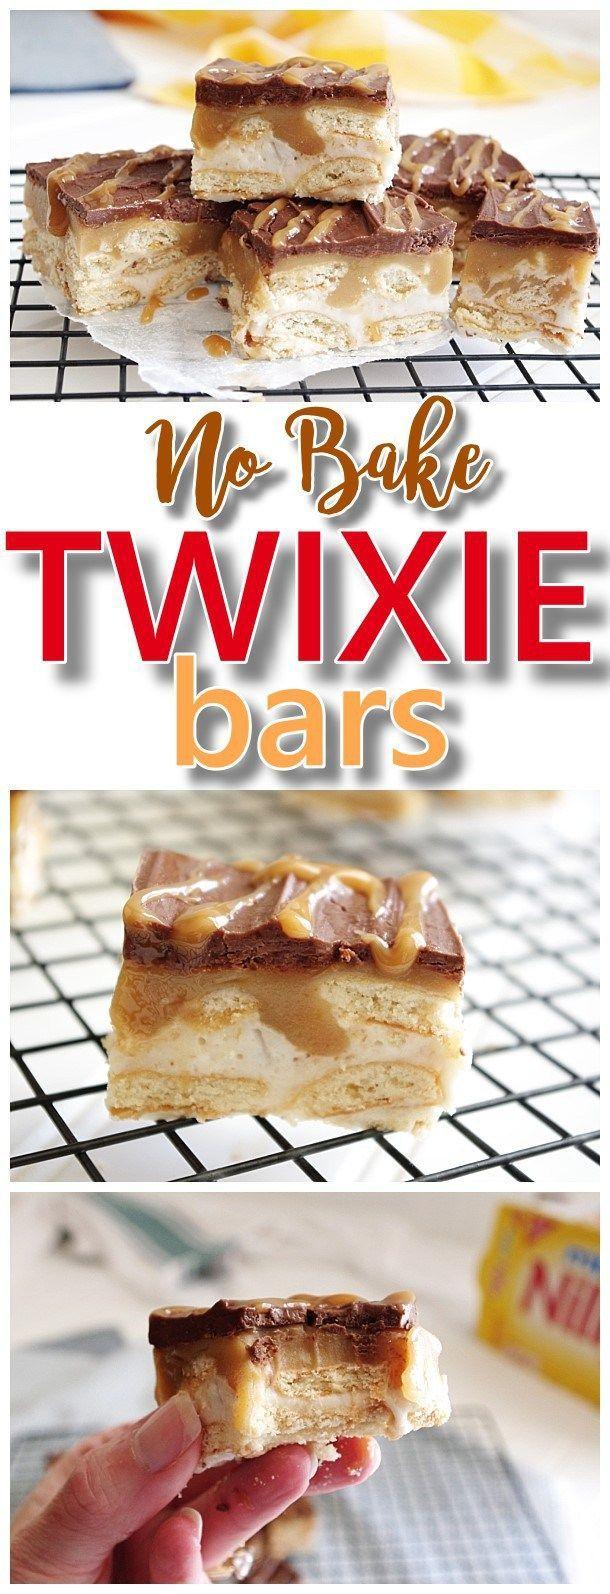 Twixie Bars - No Bake Dessert Treats EASY Twixie Bars No Bake Dessert Treats Recipe with Chocolate Caramel Nilla Wafers Layered Yummy Dessert Bars Recipe for TWIX Candy Bar lovers